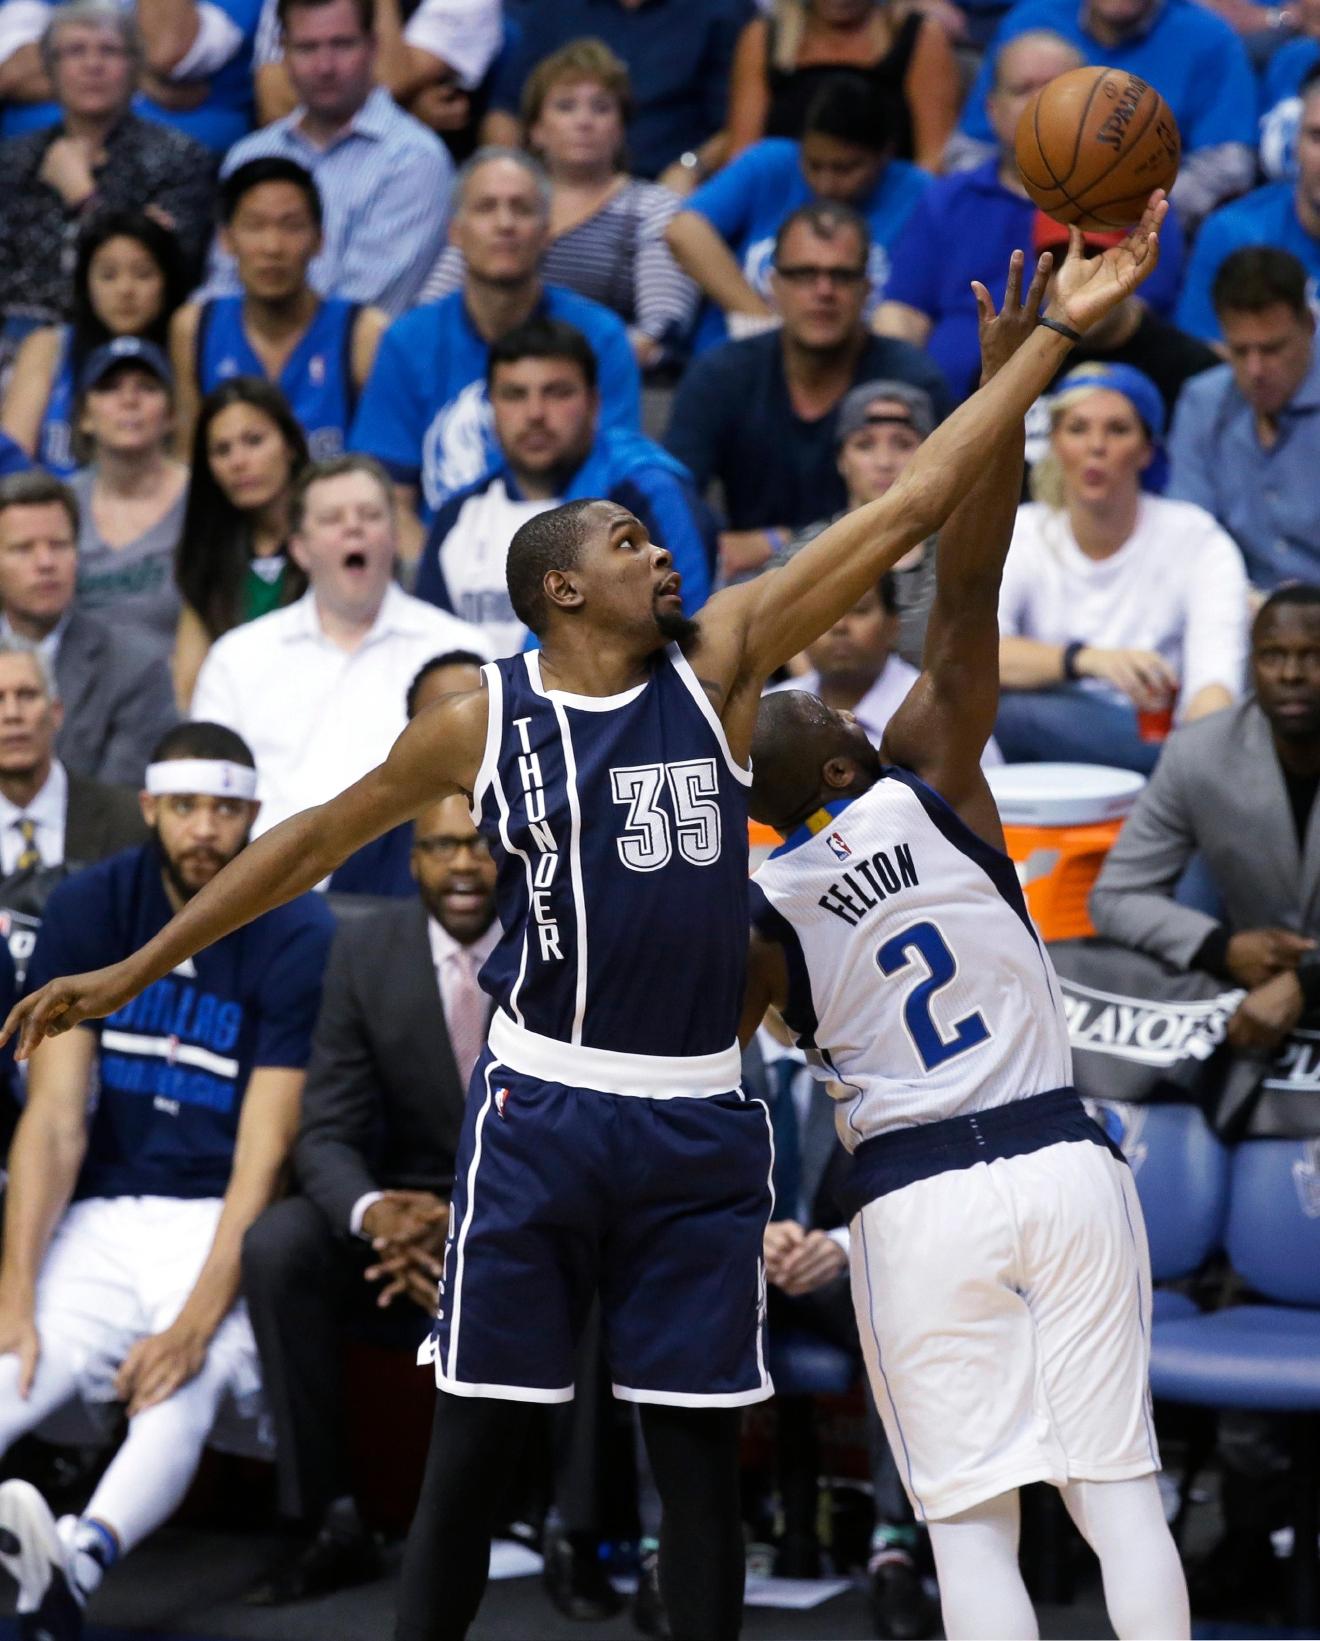 Color game ray otero - Oklahoma City Thunder Forward Kevin Durant 35 Reaches For The Ball Against Dallas Mavericks